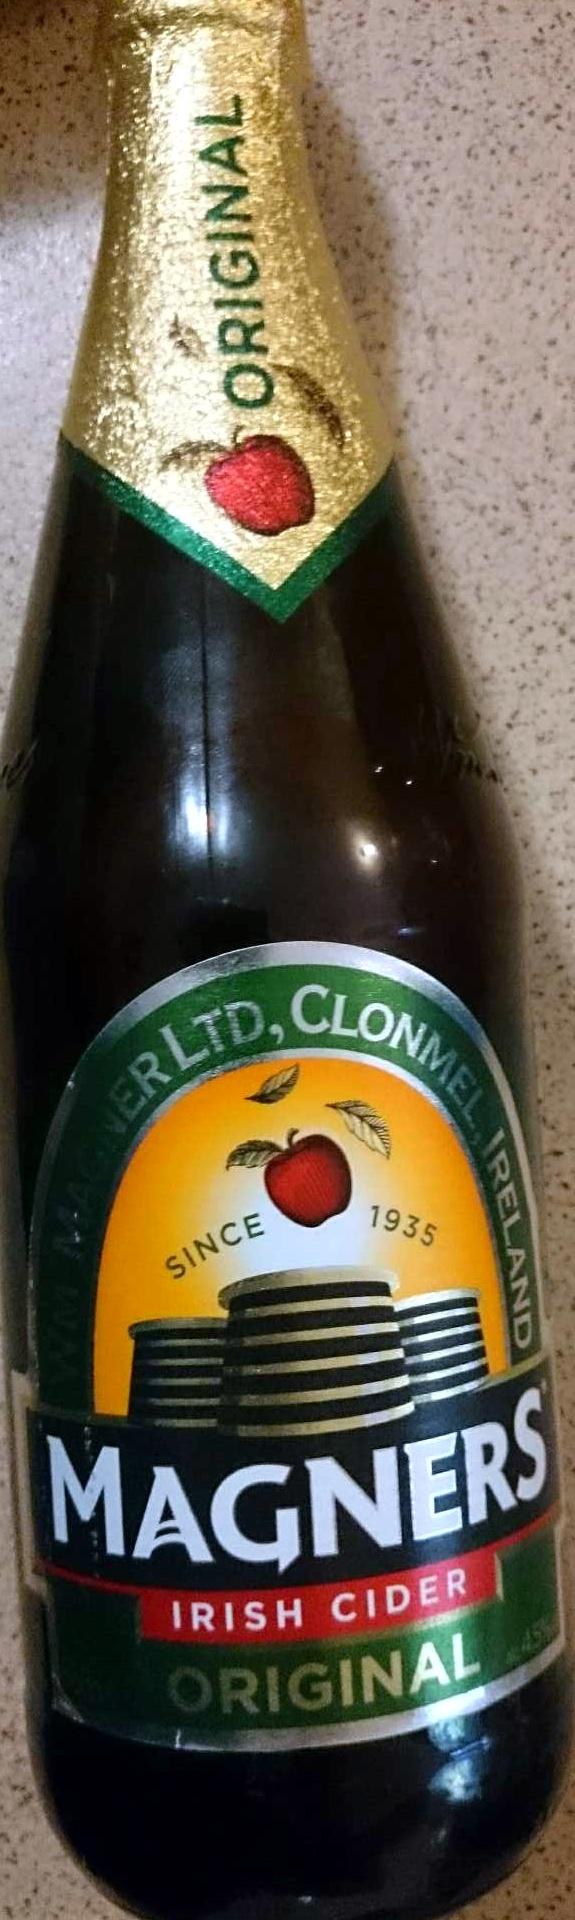 Irish Cider - Product